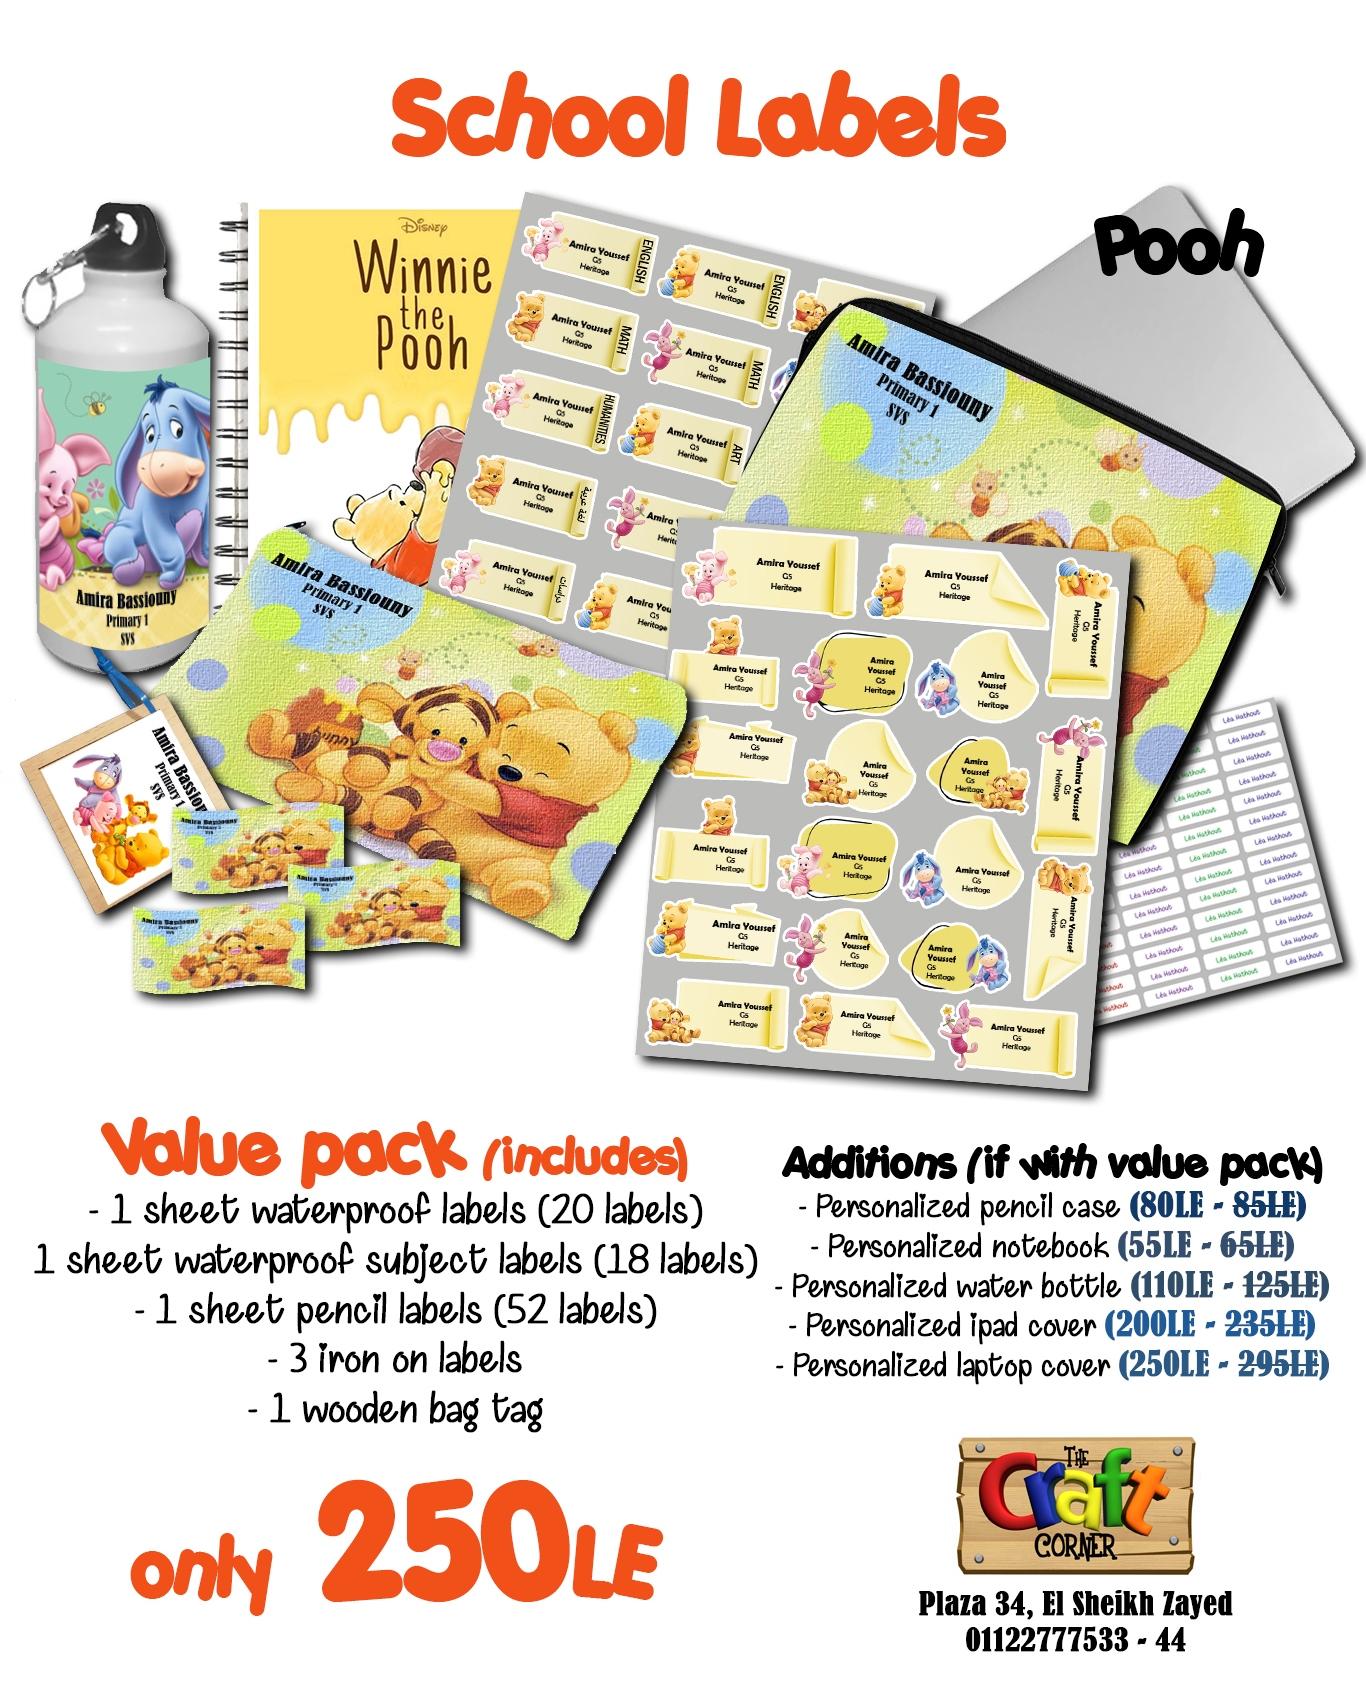 Pooh ad